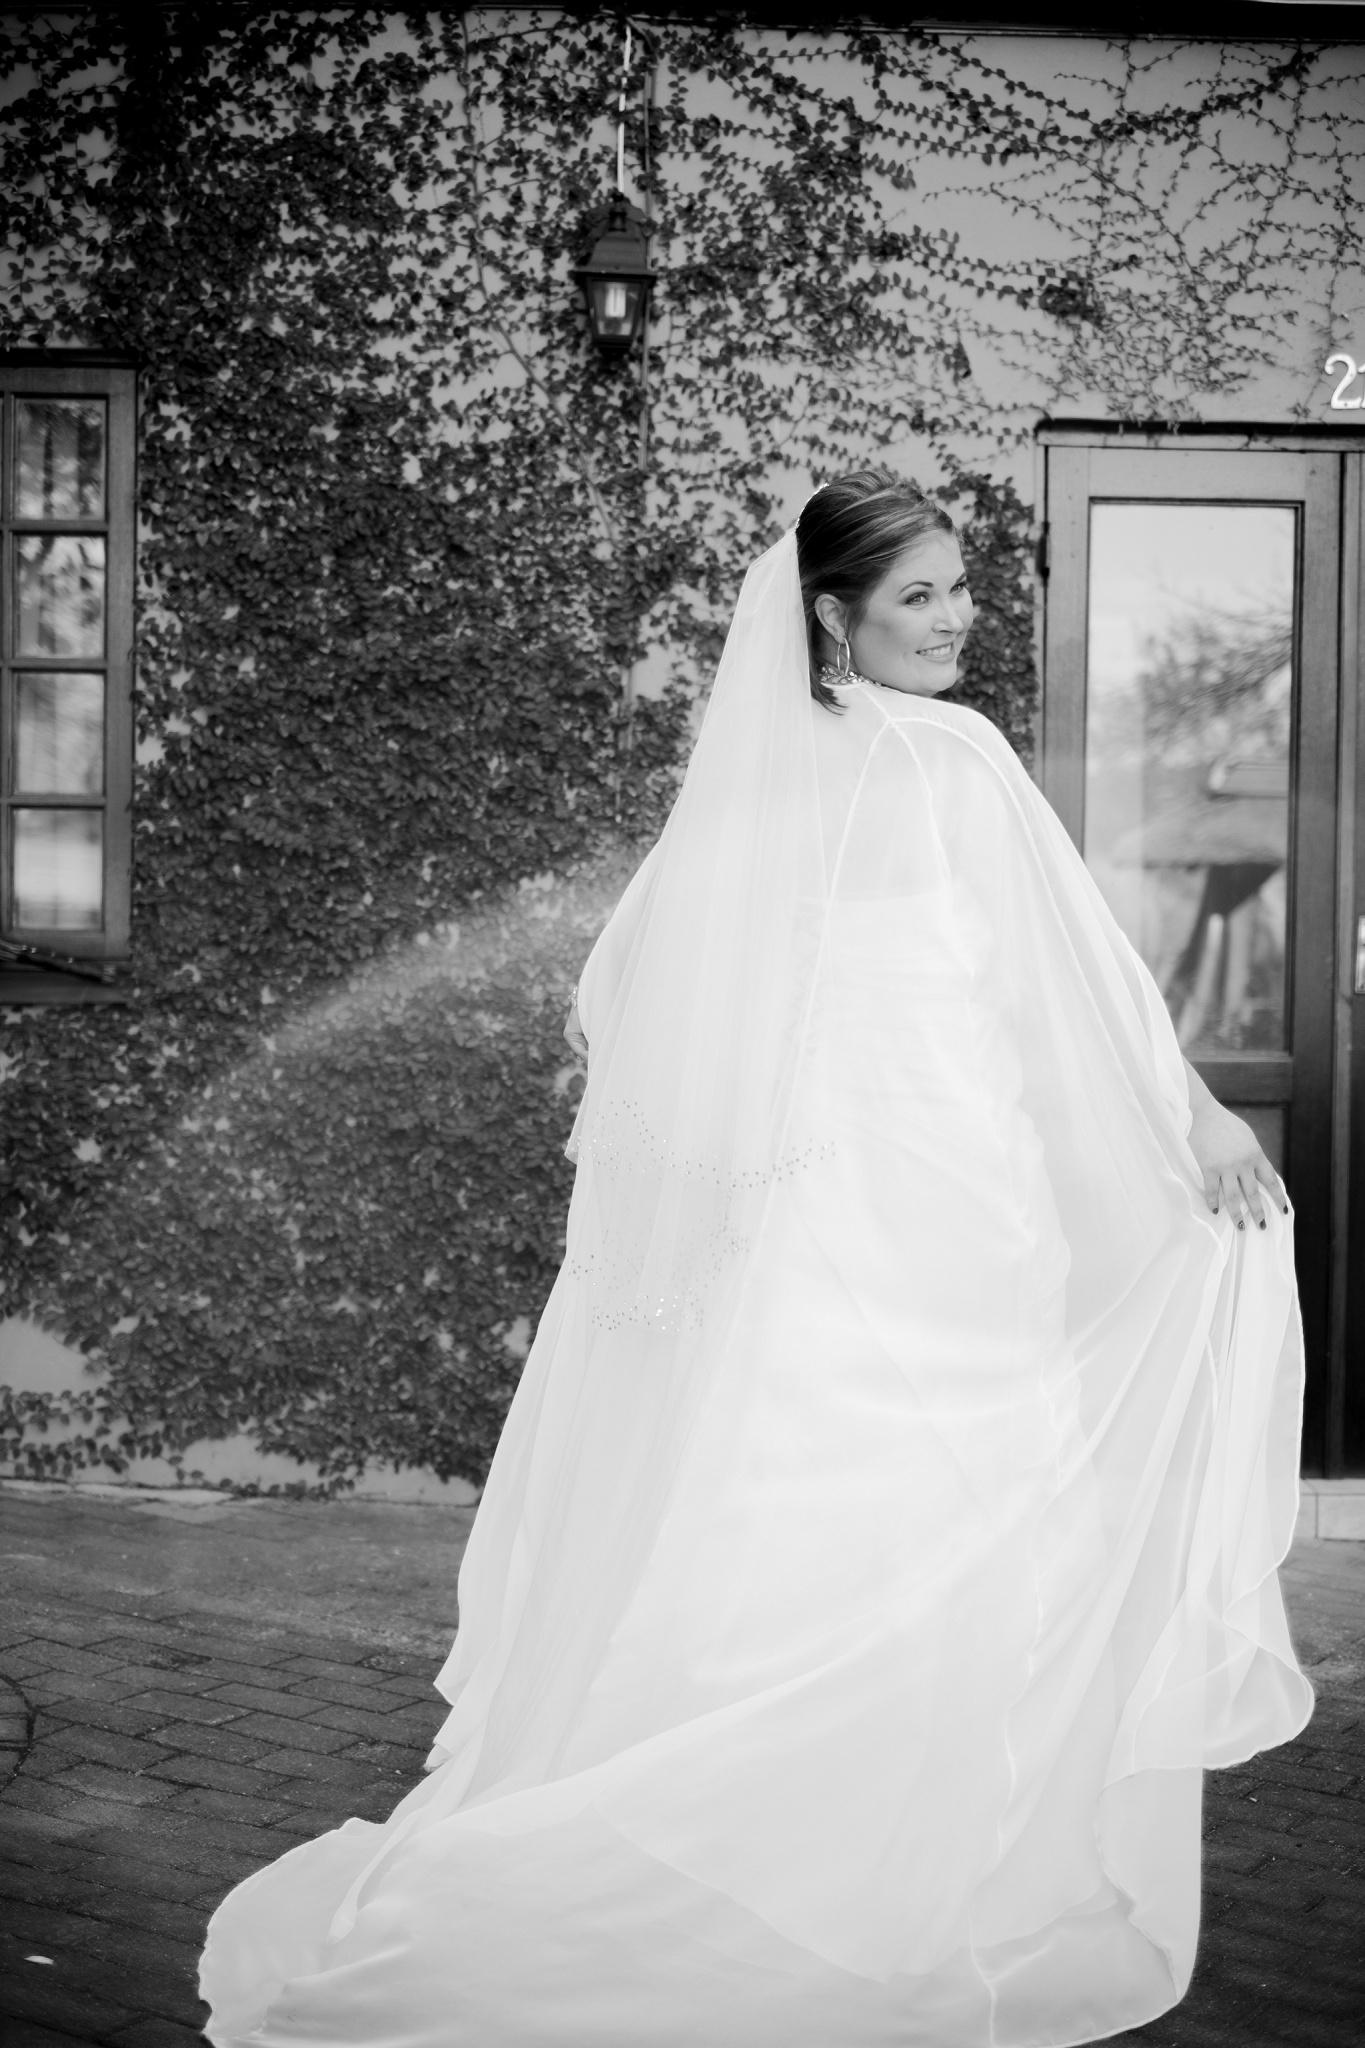 VanillaSilk_WeddingPhotography_Travelling_0126